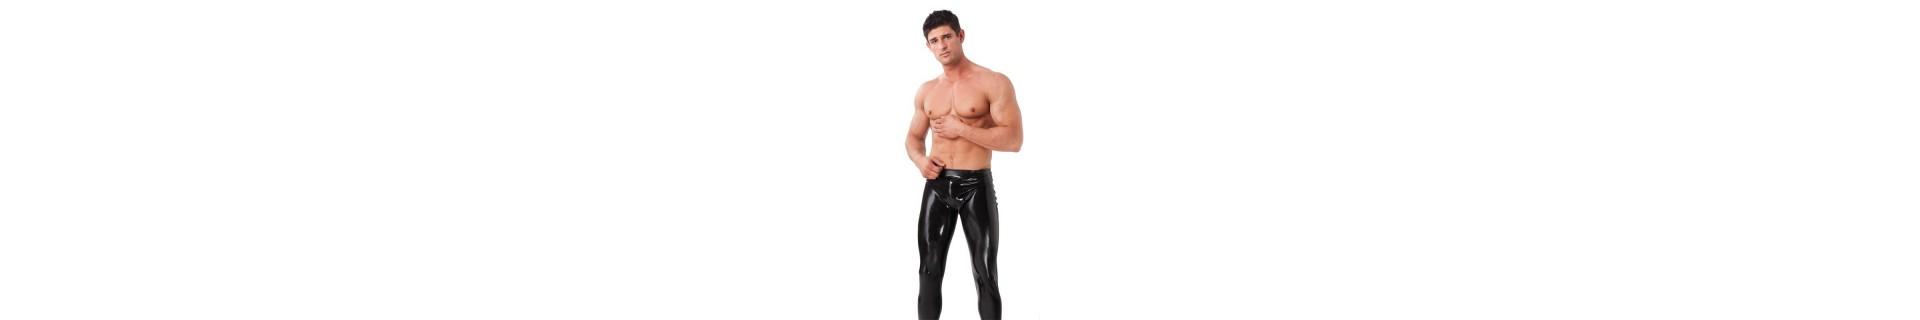 Comprar pantalones eróticos online 【Envío discreto】 ❤️